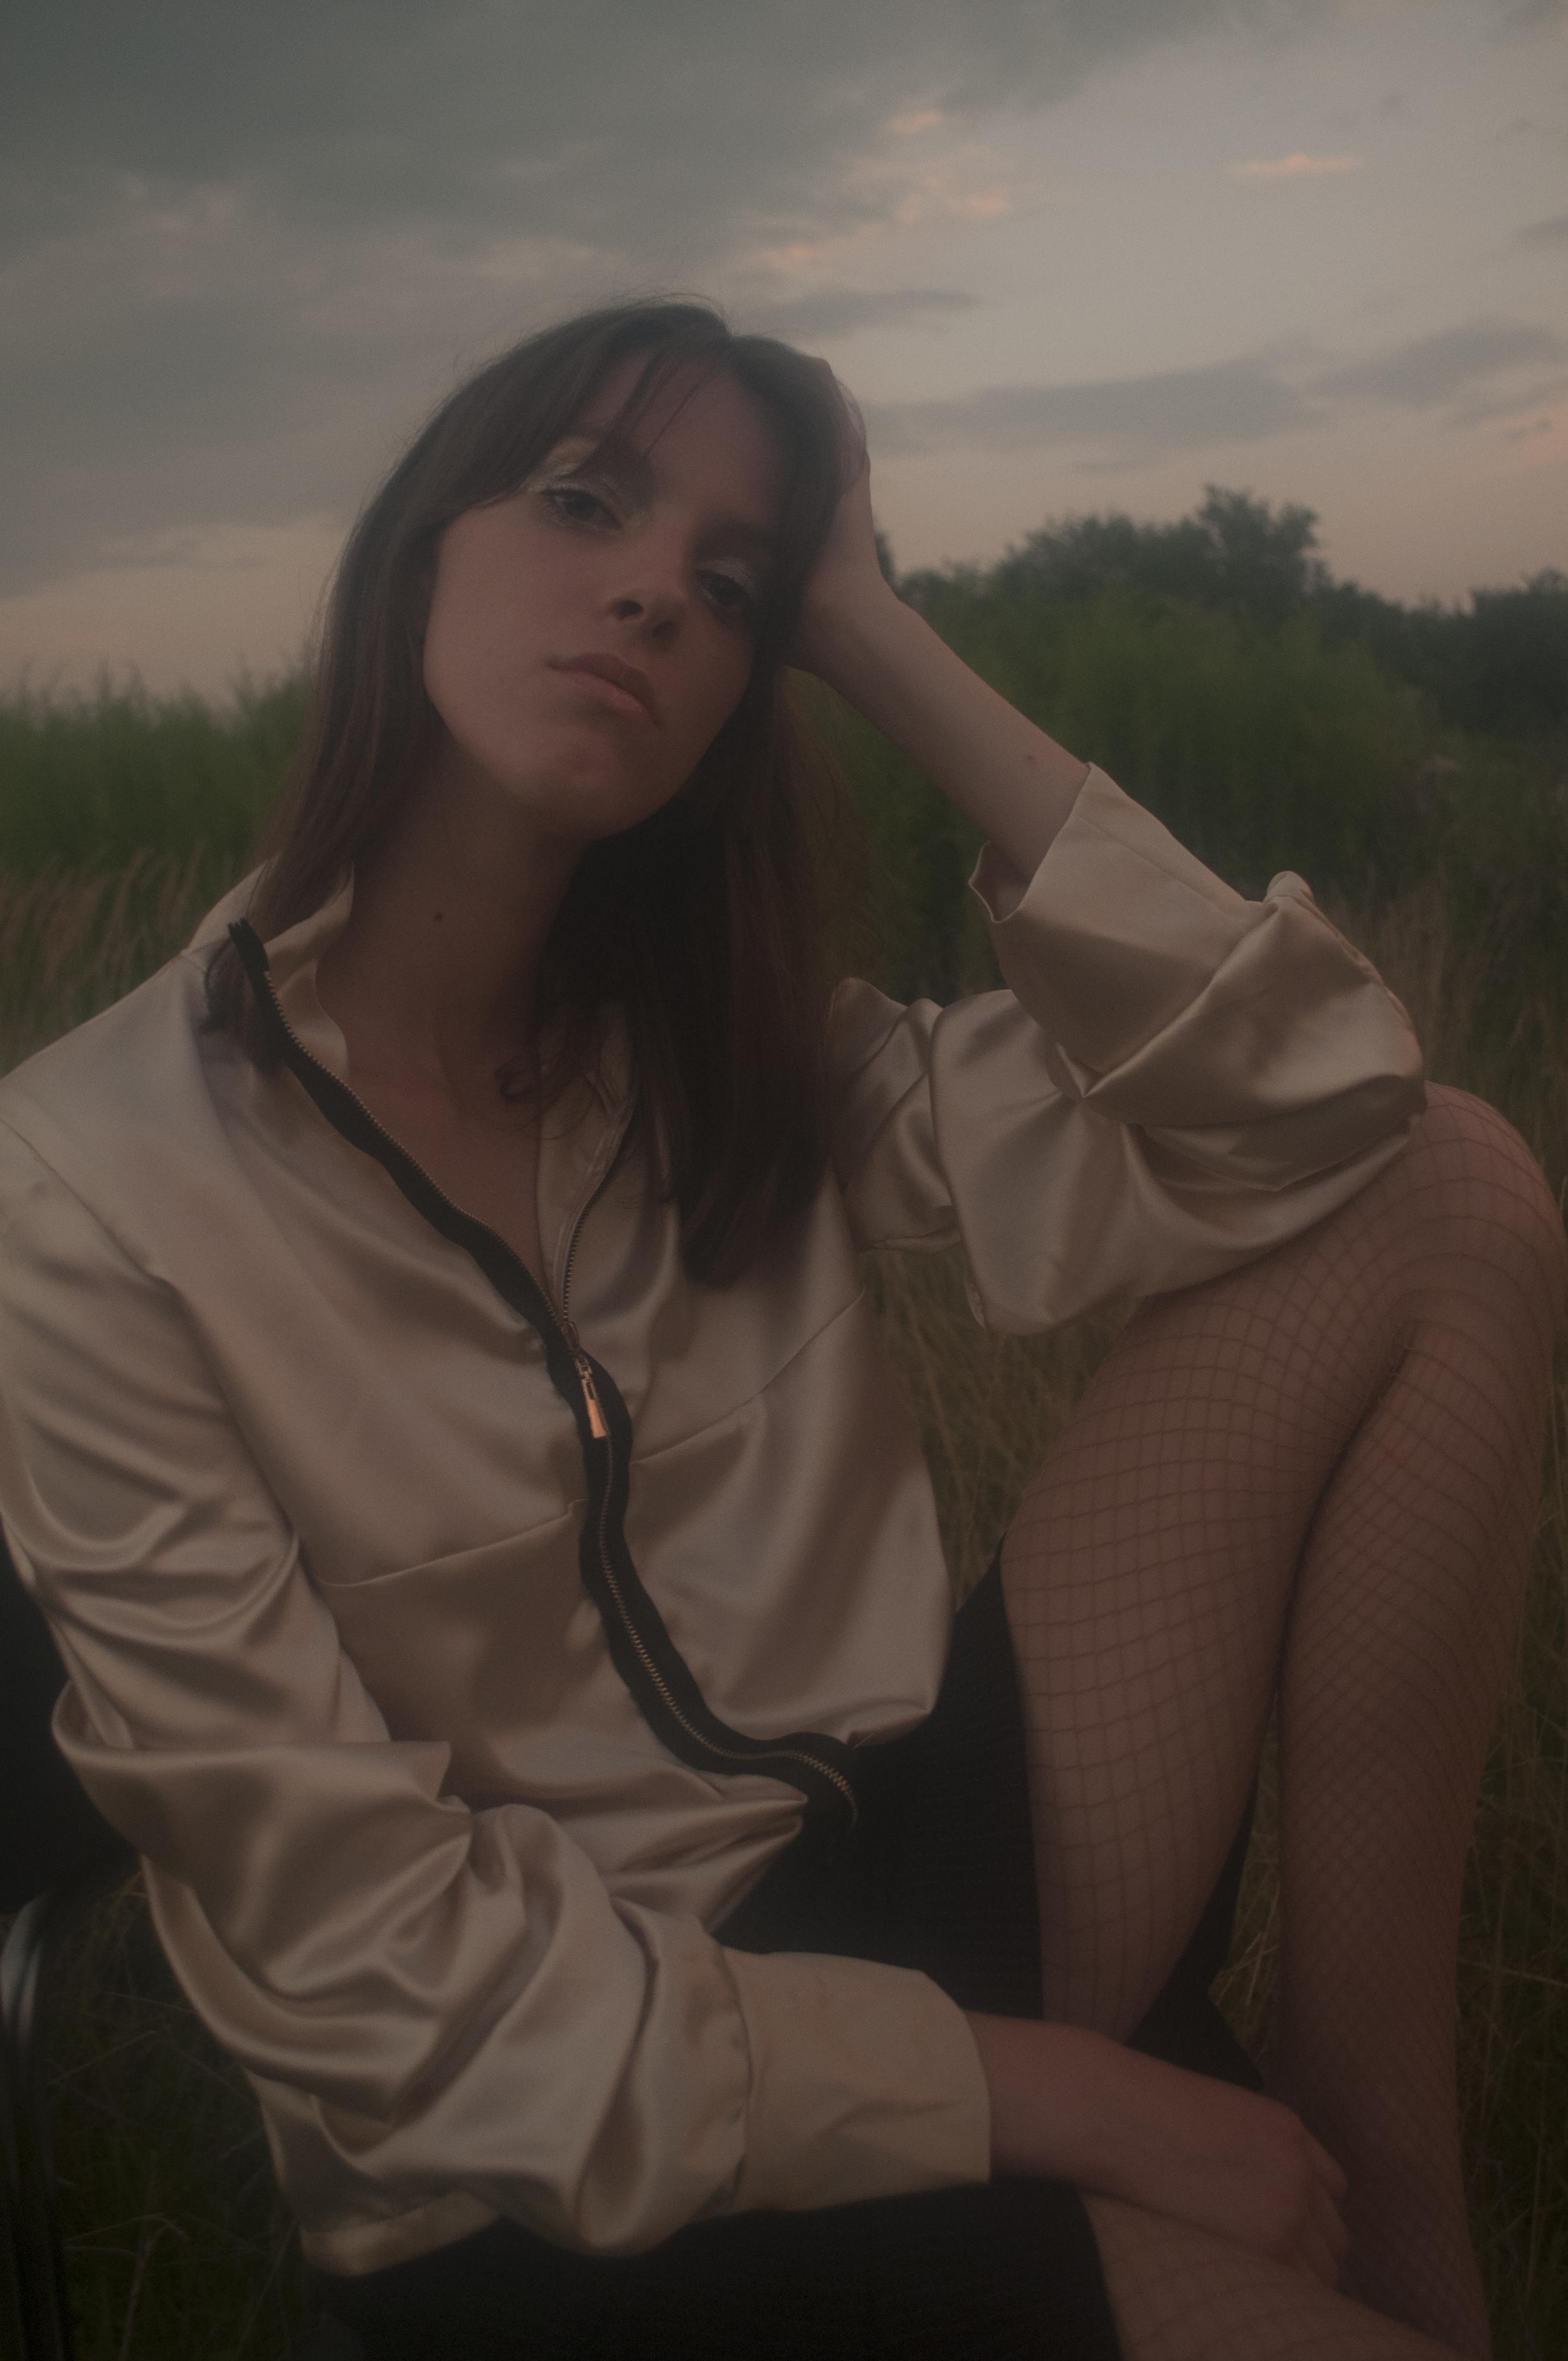 satin blouse DRAMAT, skirt ESCADA